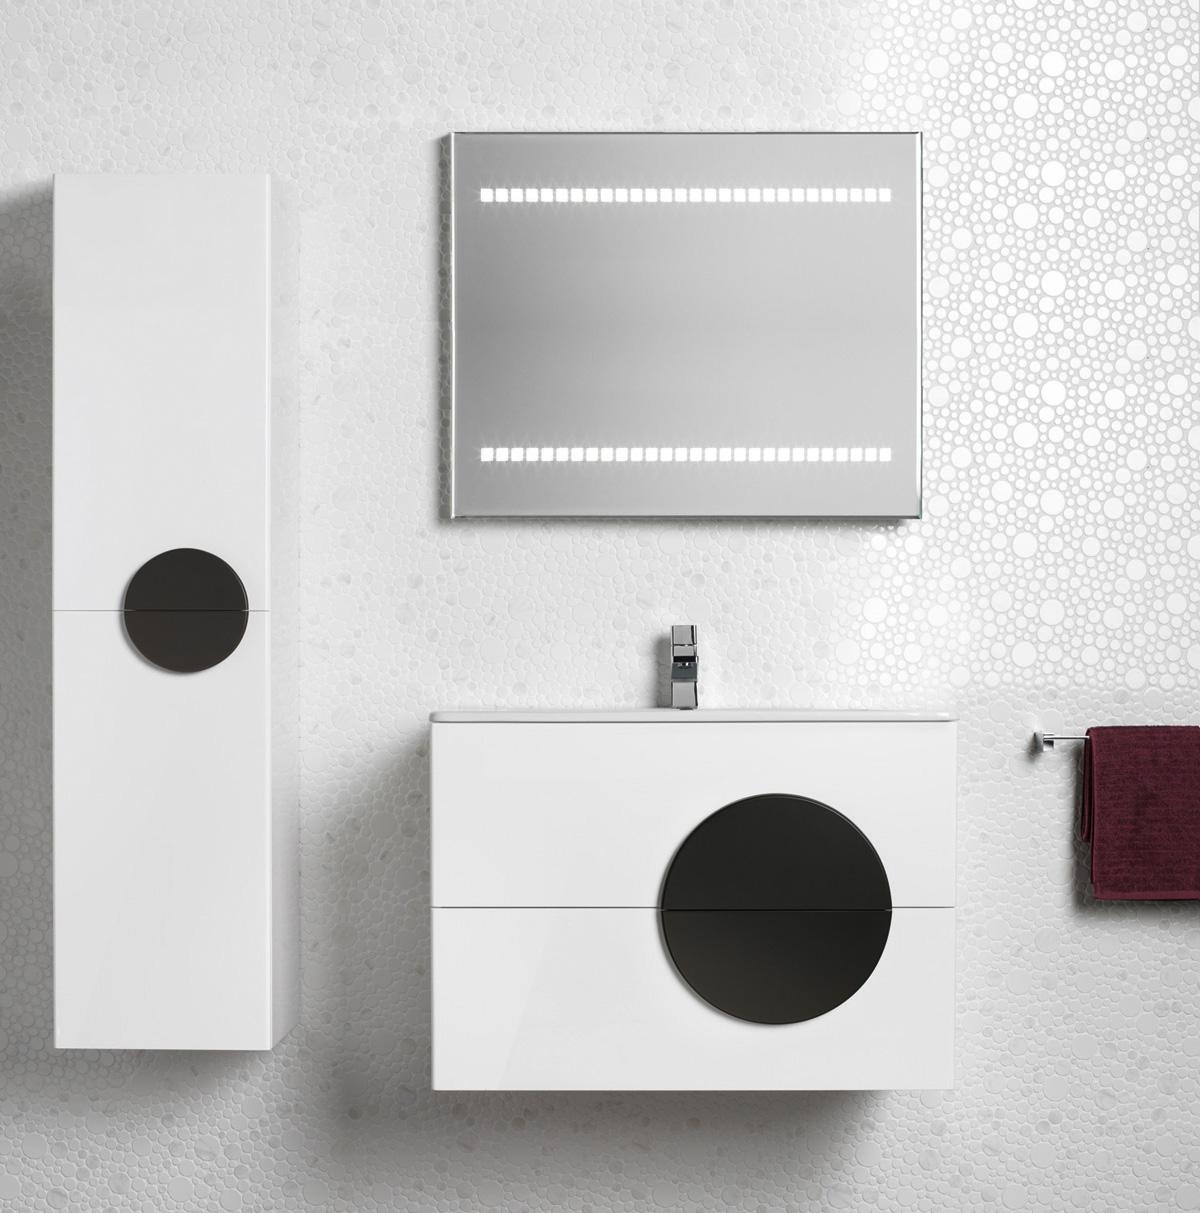 Obiecte sanitare - Colectia ZAFIRO-12 GALA - Poza 1